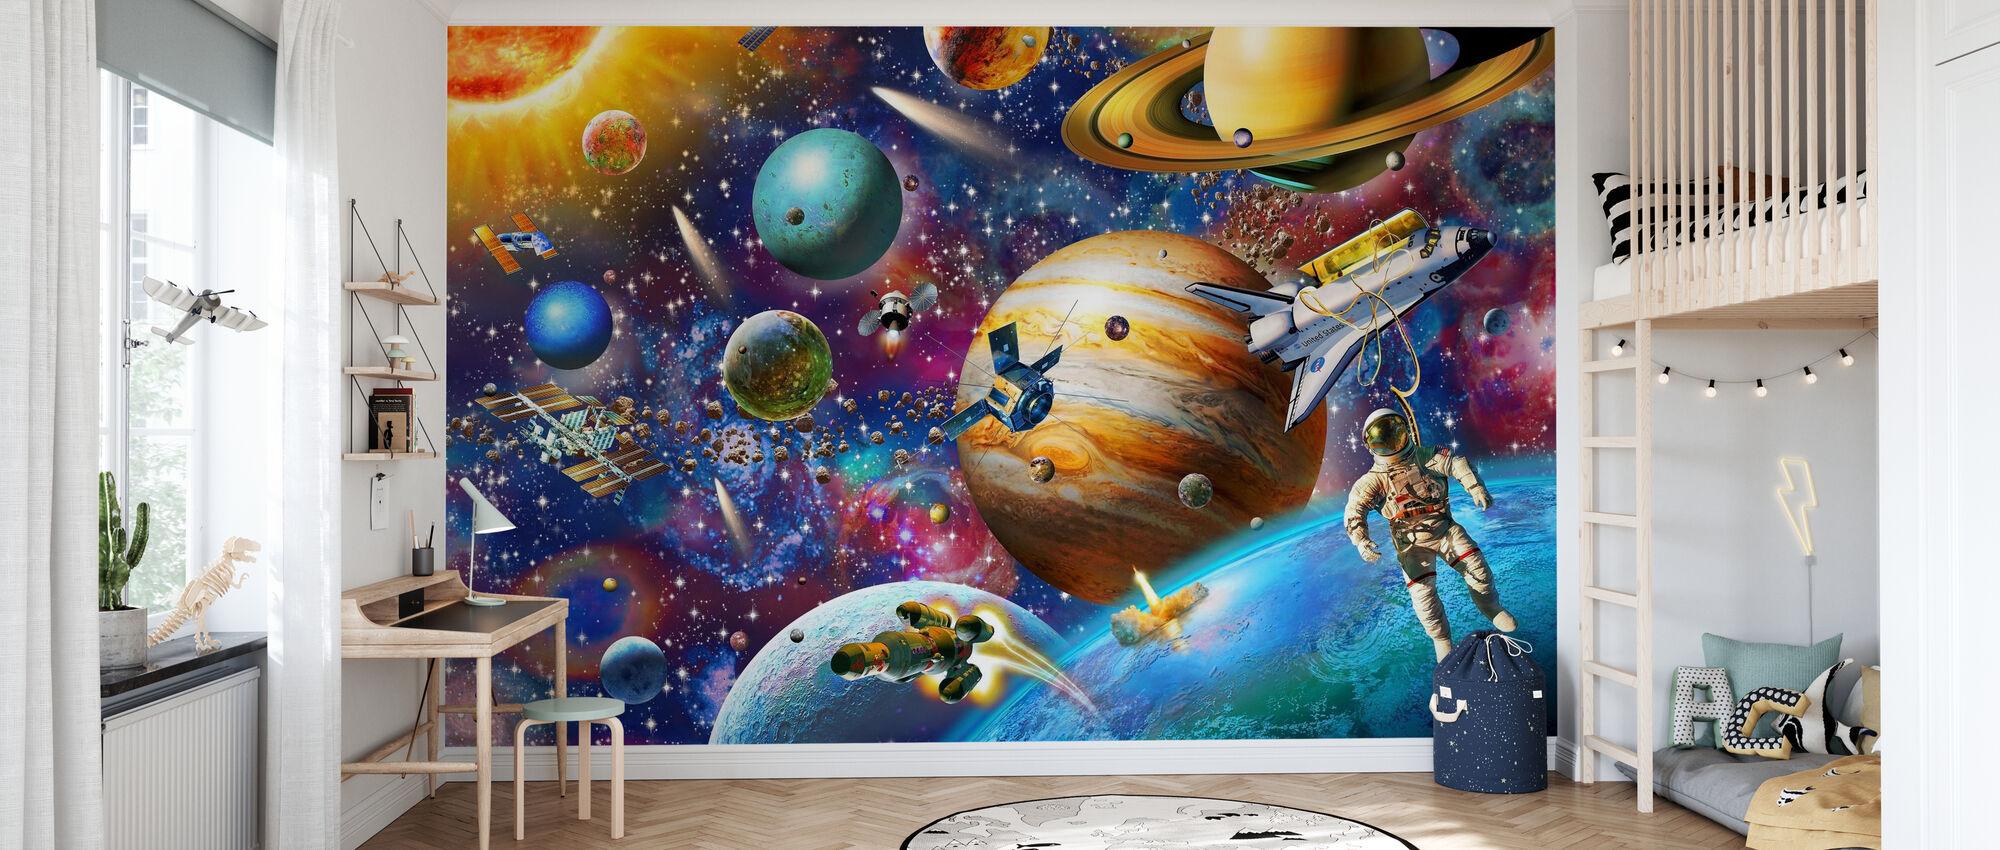 Solar System Odyssey - Wallpaper - Kids Room